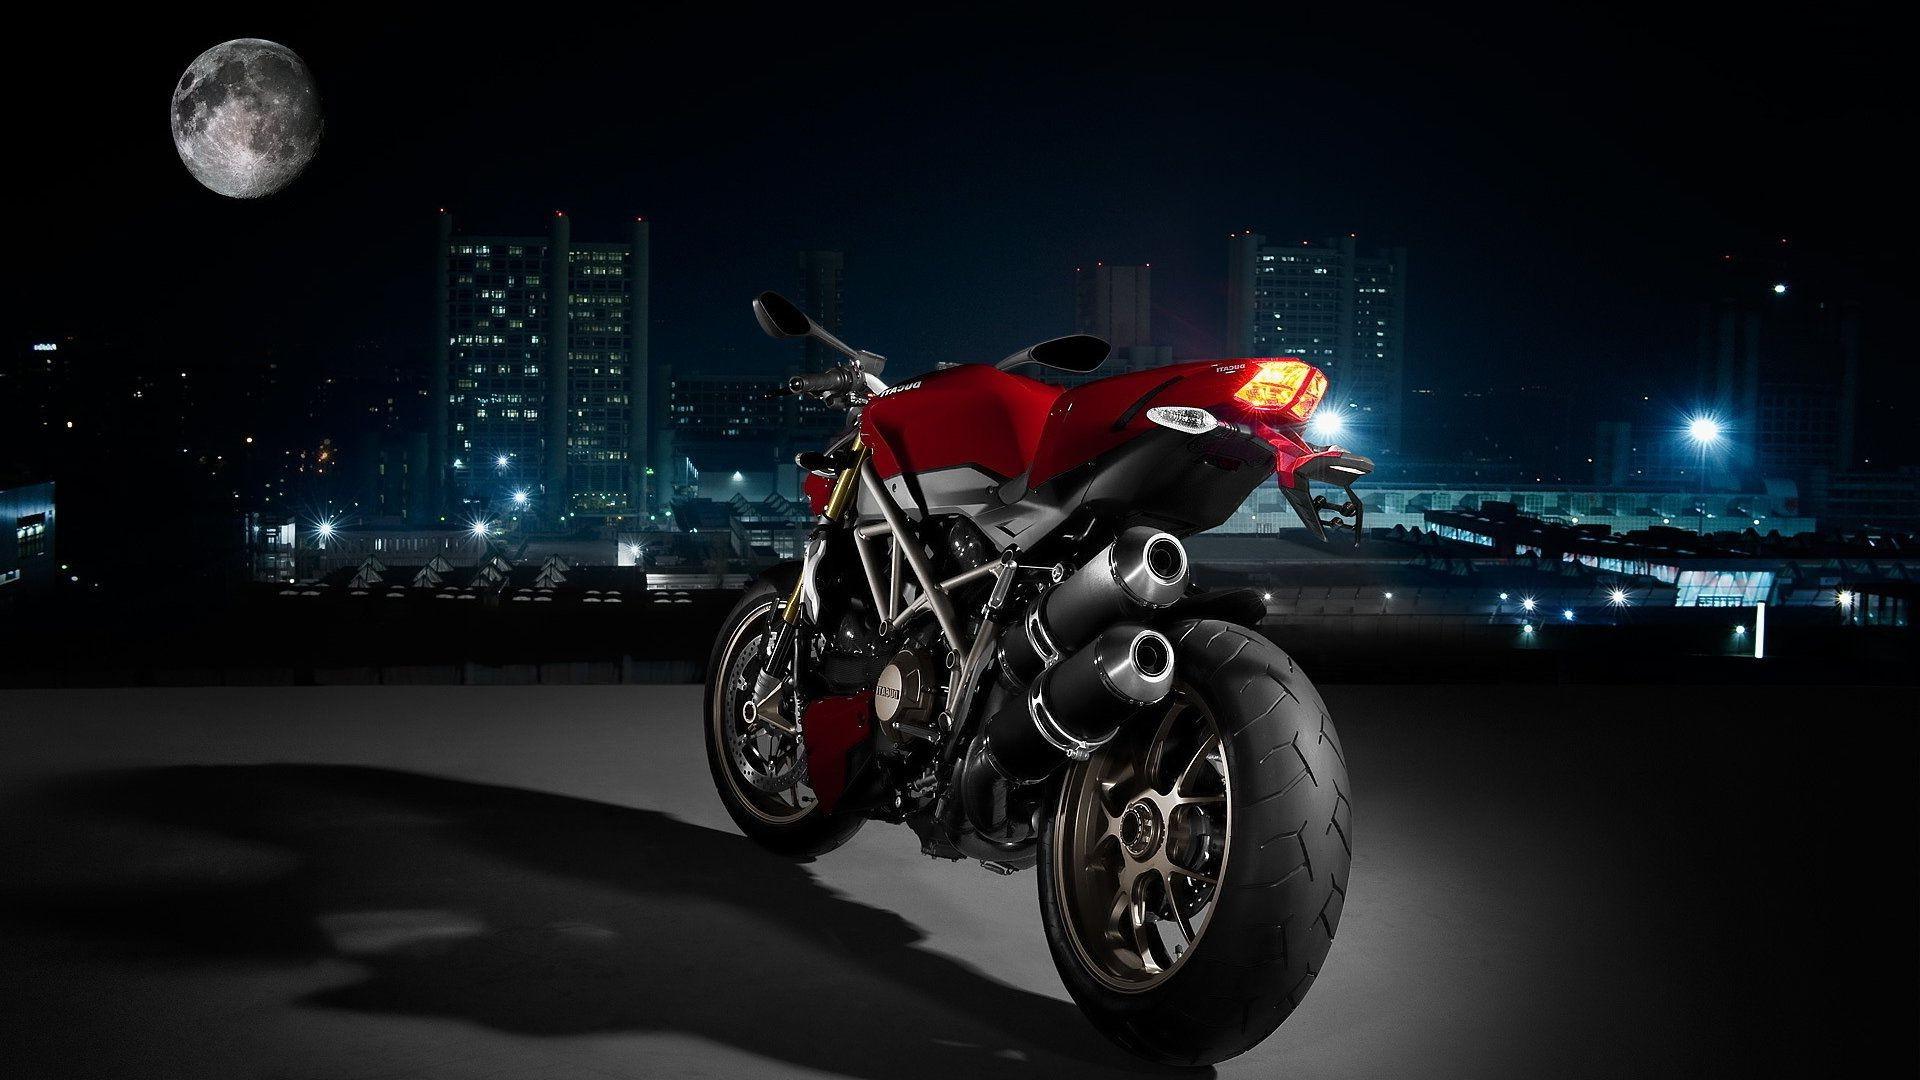 мотоциклы обои на рабочий стол фото № 596537 без смс